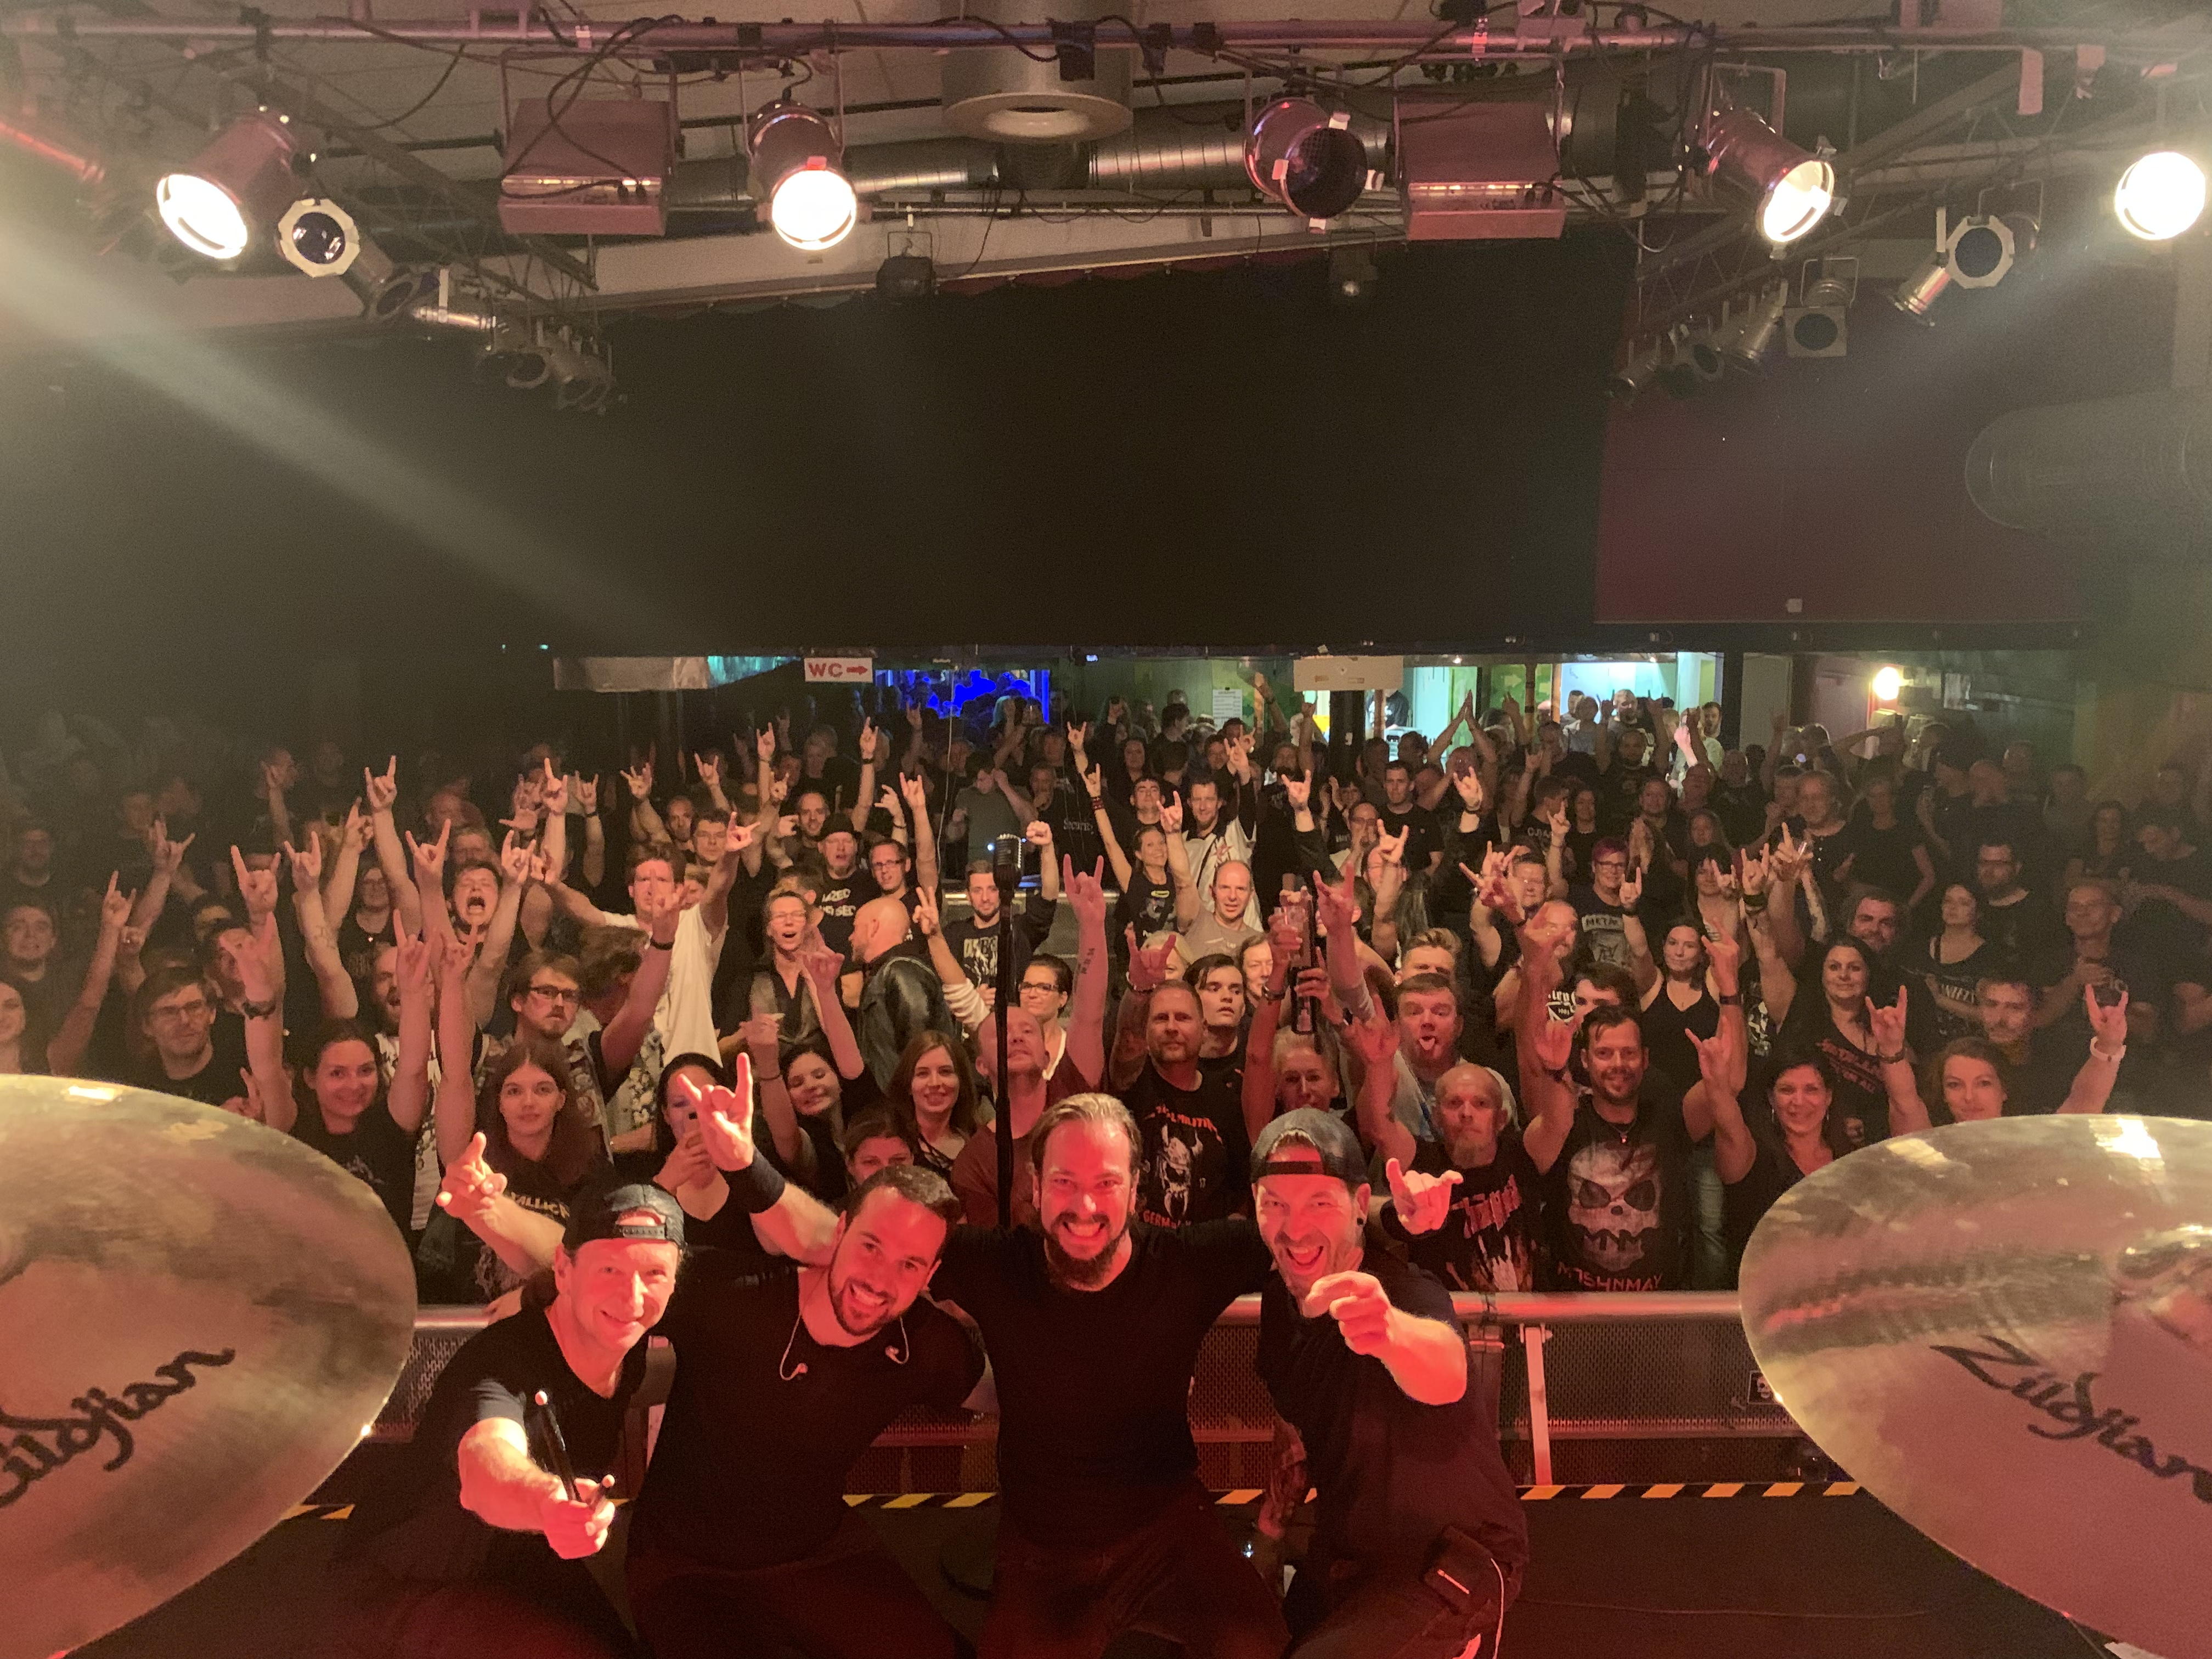 mytallica-lingen-alter-schlachthof-2019-metal-militia-thank-you